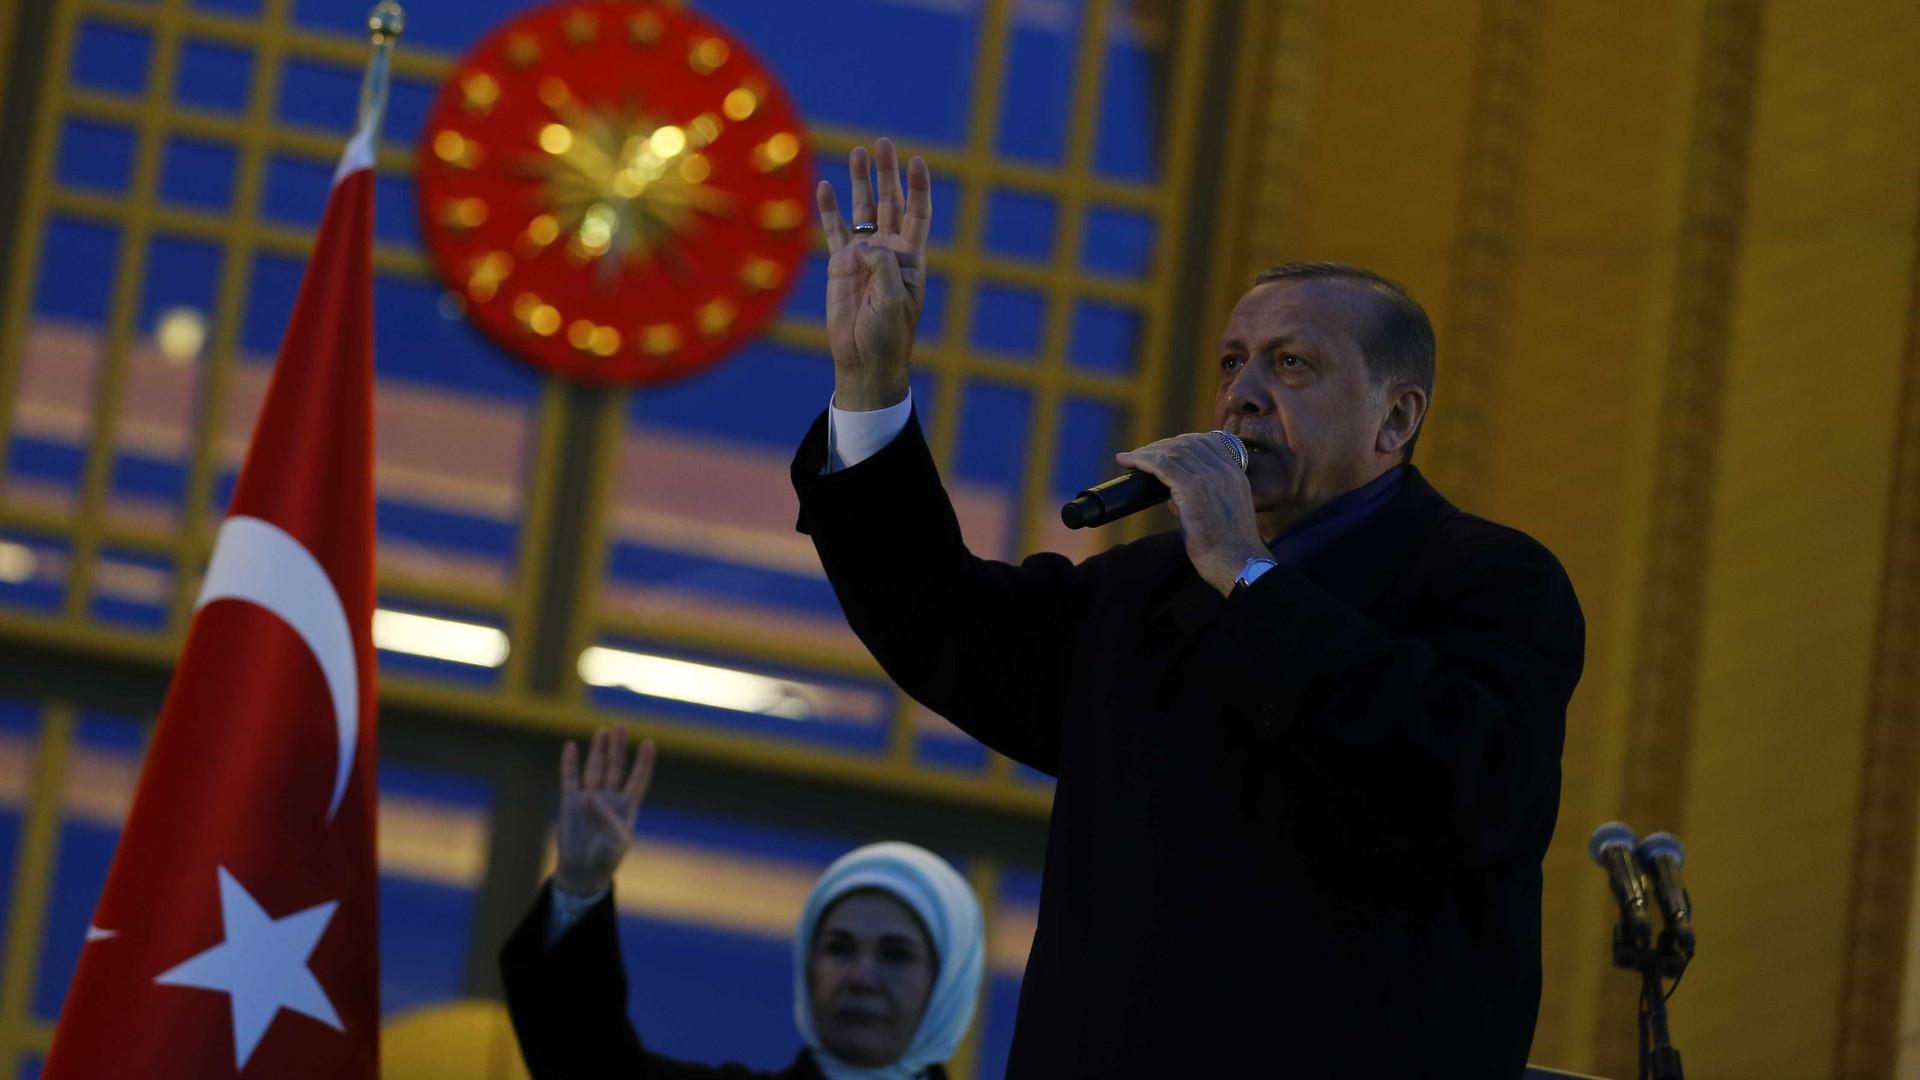 Erdogan encerra debate sobre referendo e anuncia encontro com Trump